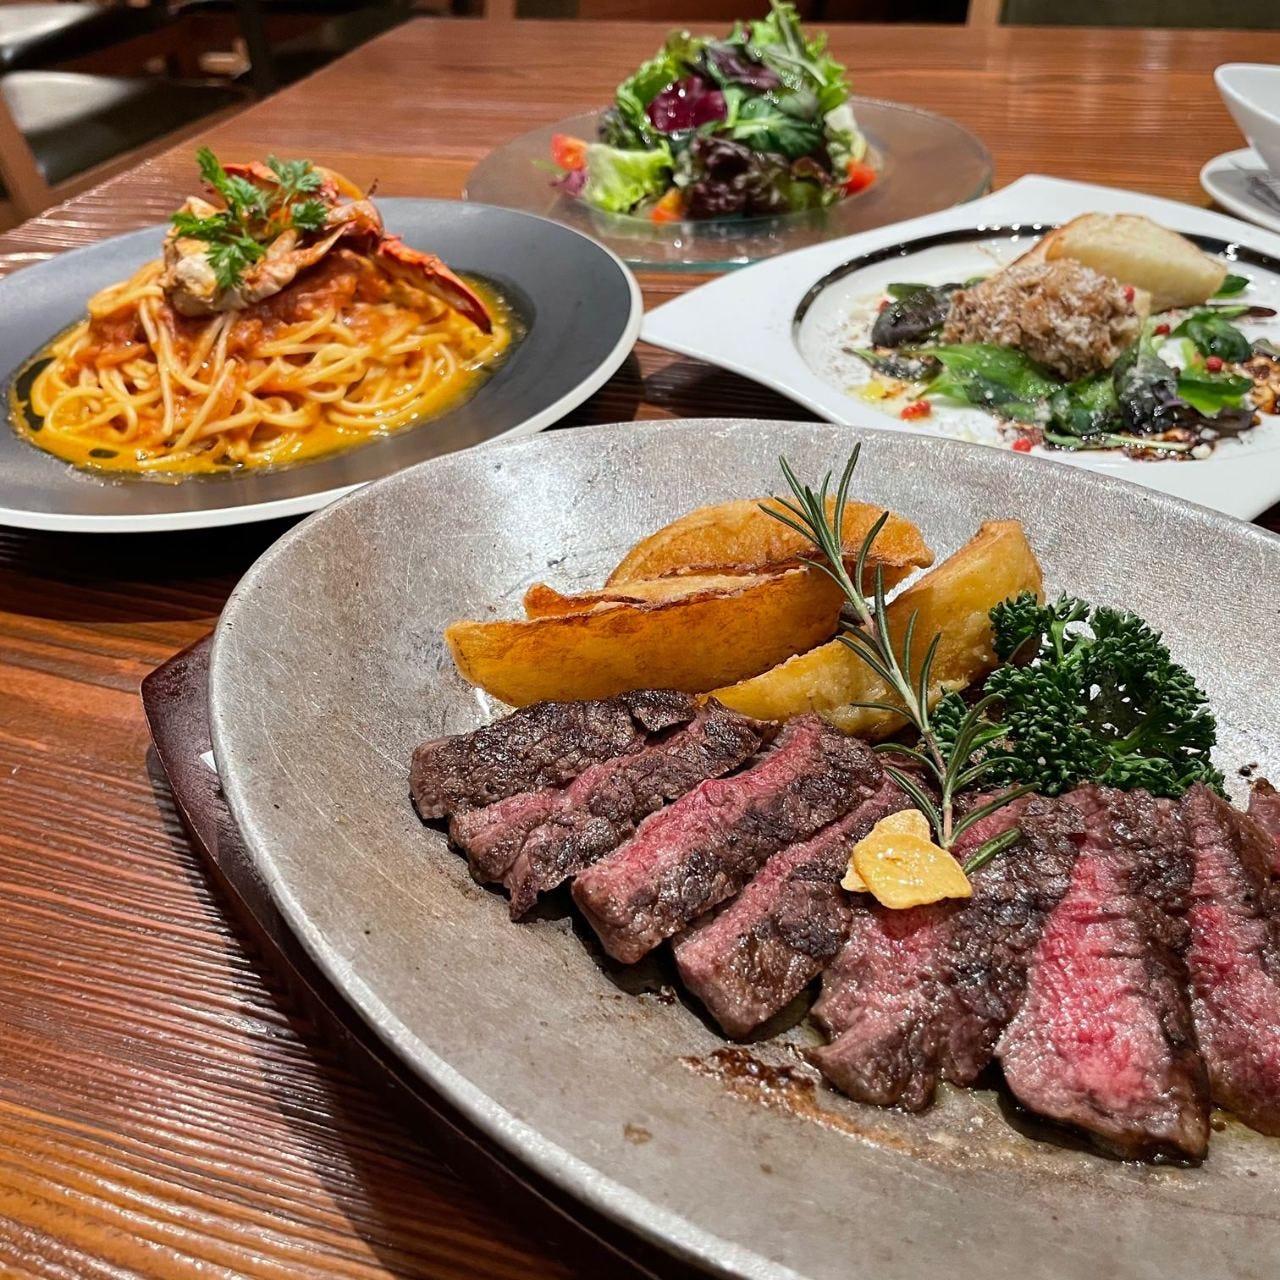 【Joeの新定番】 お食事にもお祝にもおすすめ♪ 国産牛ヒレステーキ&渡り蟹ディナーコース